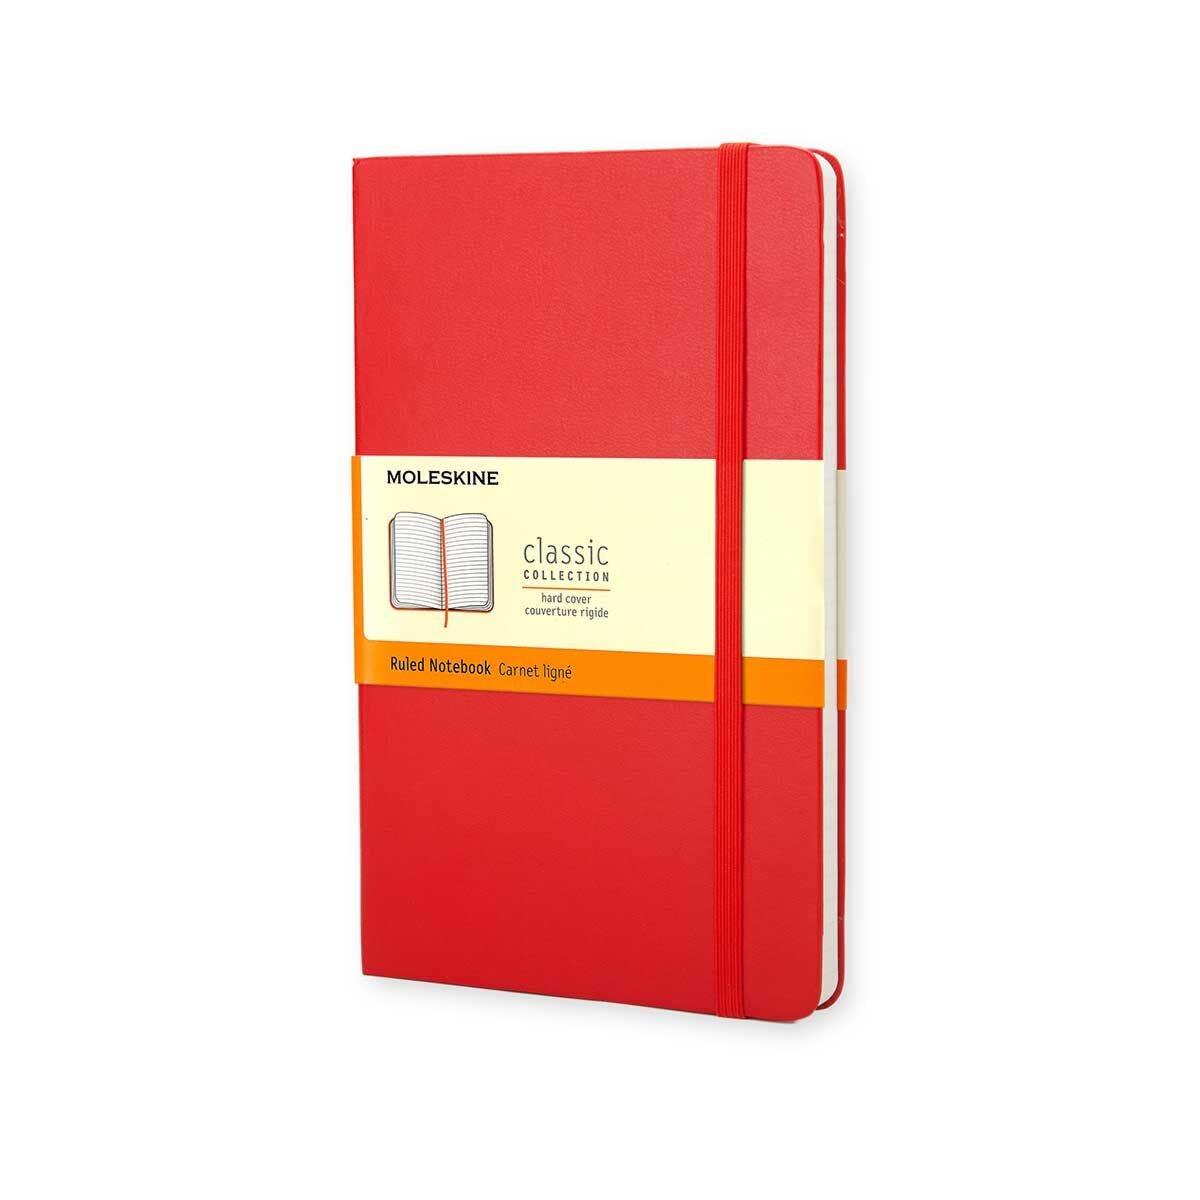 Moleskine Notebook Pocket Plain Red